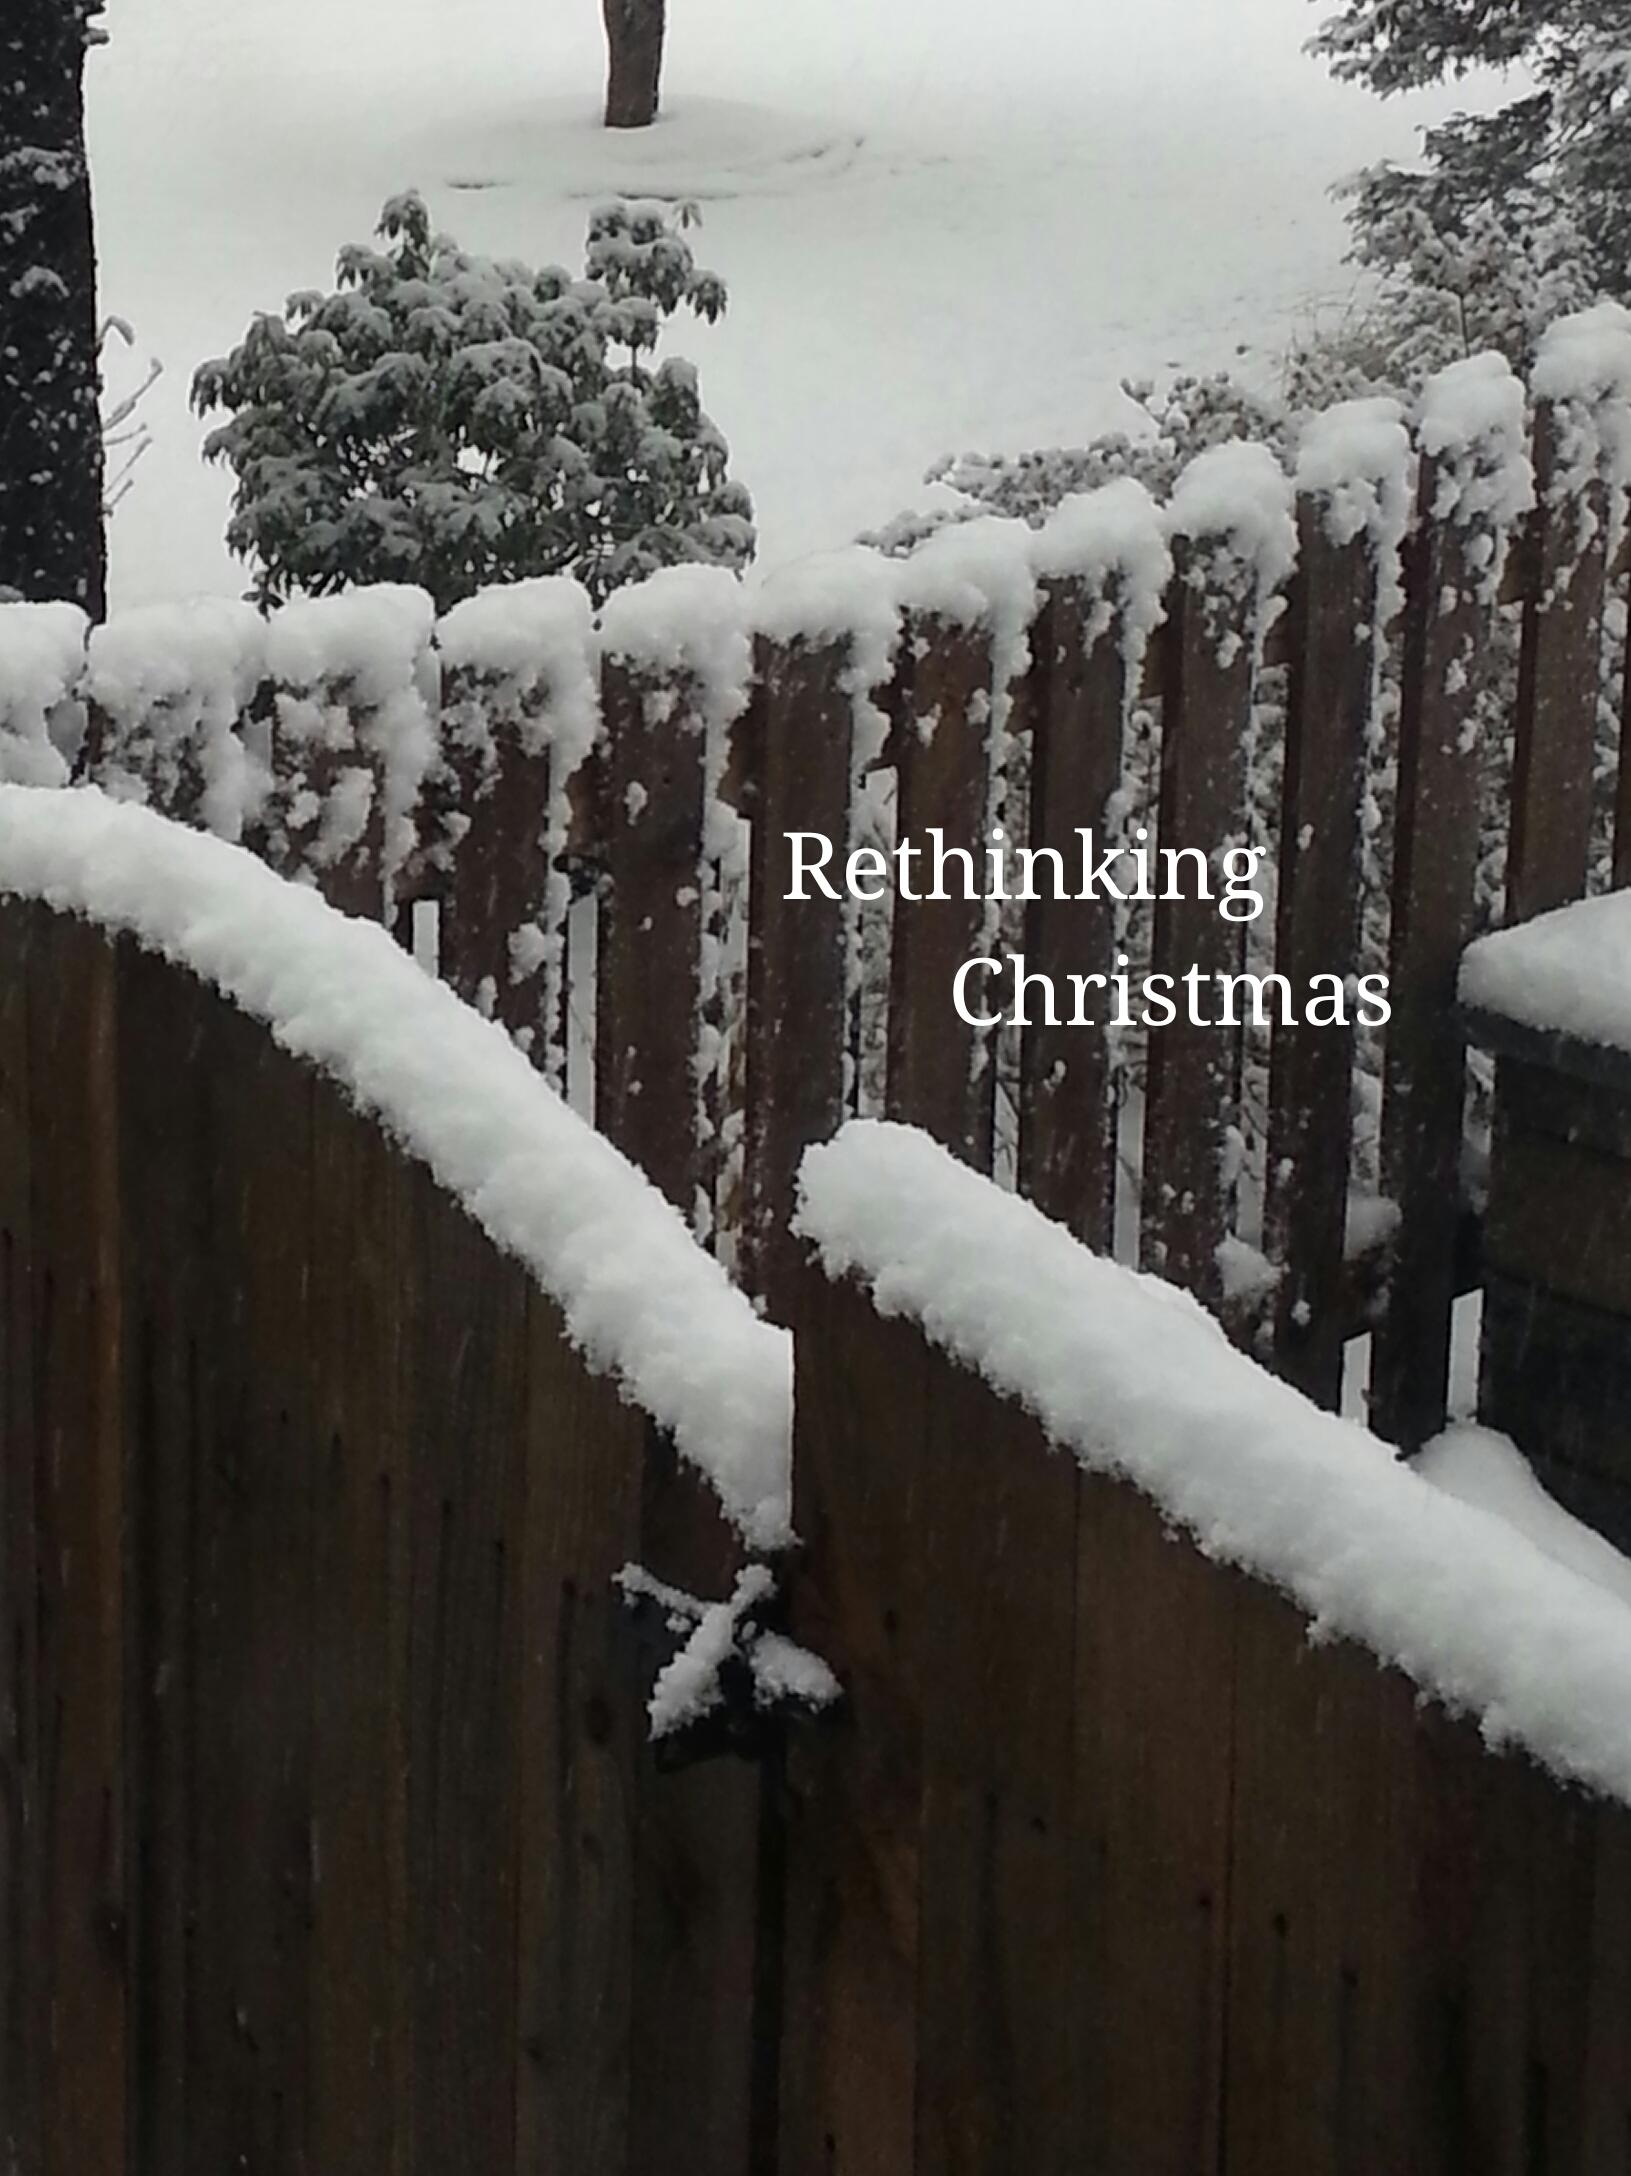 Rethinking Christmas.jpg